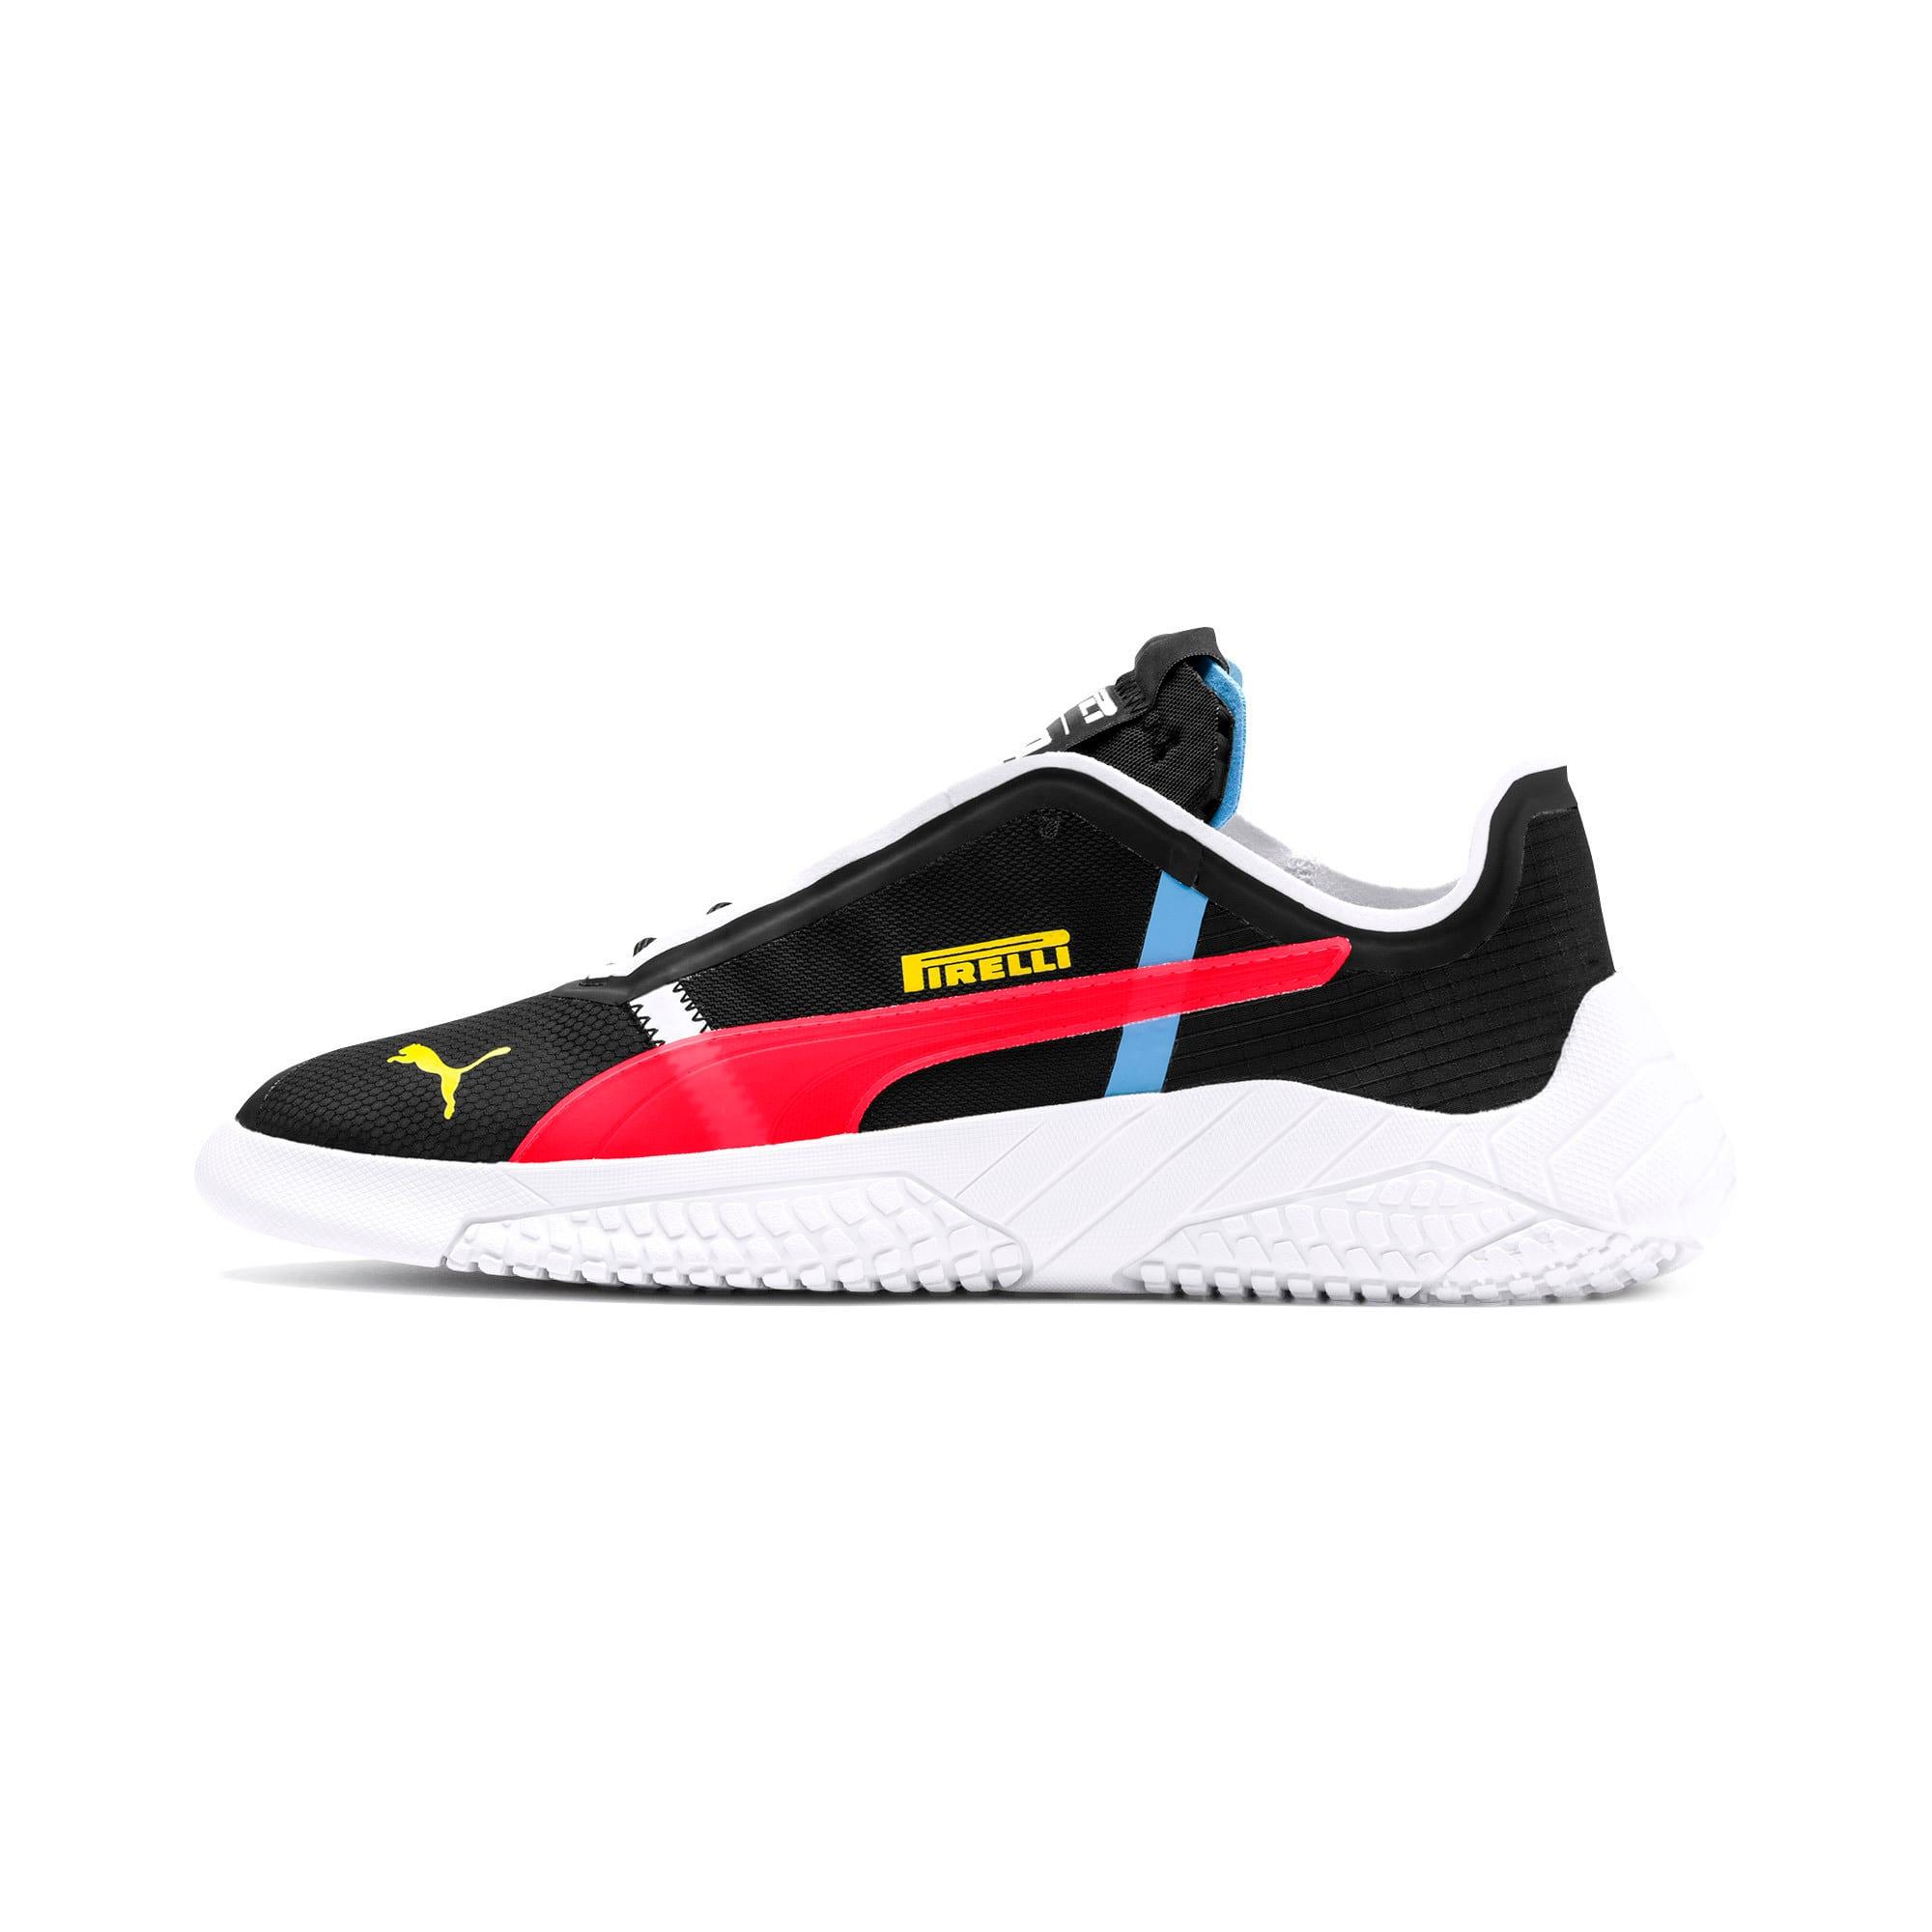 Thumbnail 1 of Replicat-X Pirelli v2 Motorsport Shoes, Black-Puma Red- White, medium